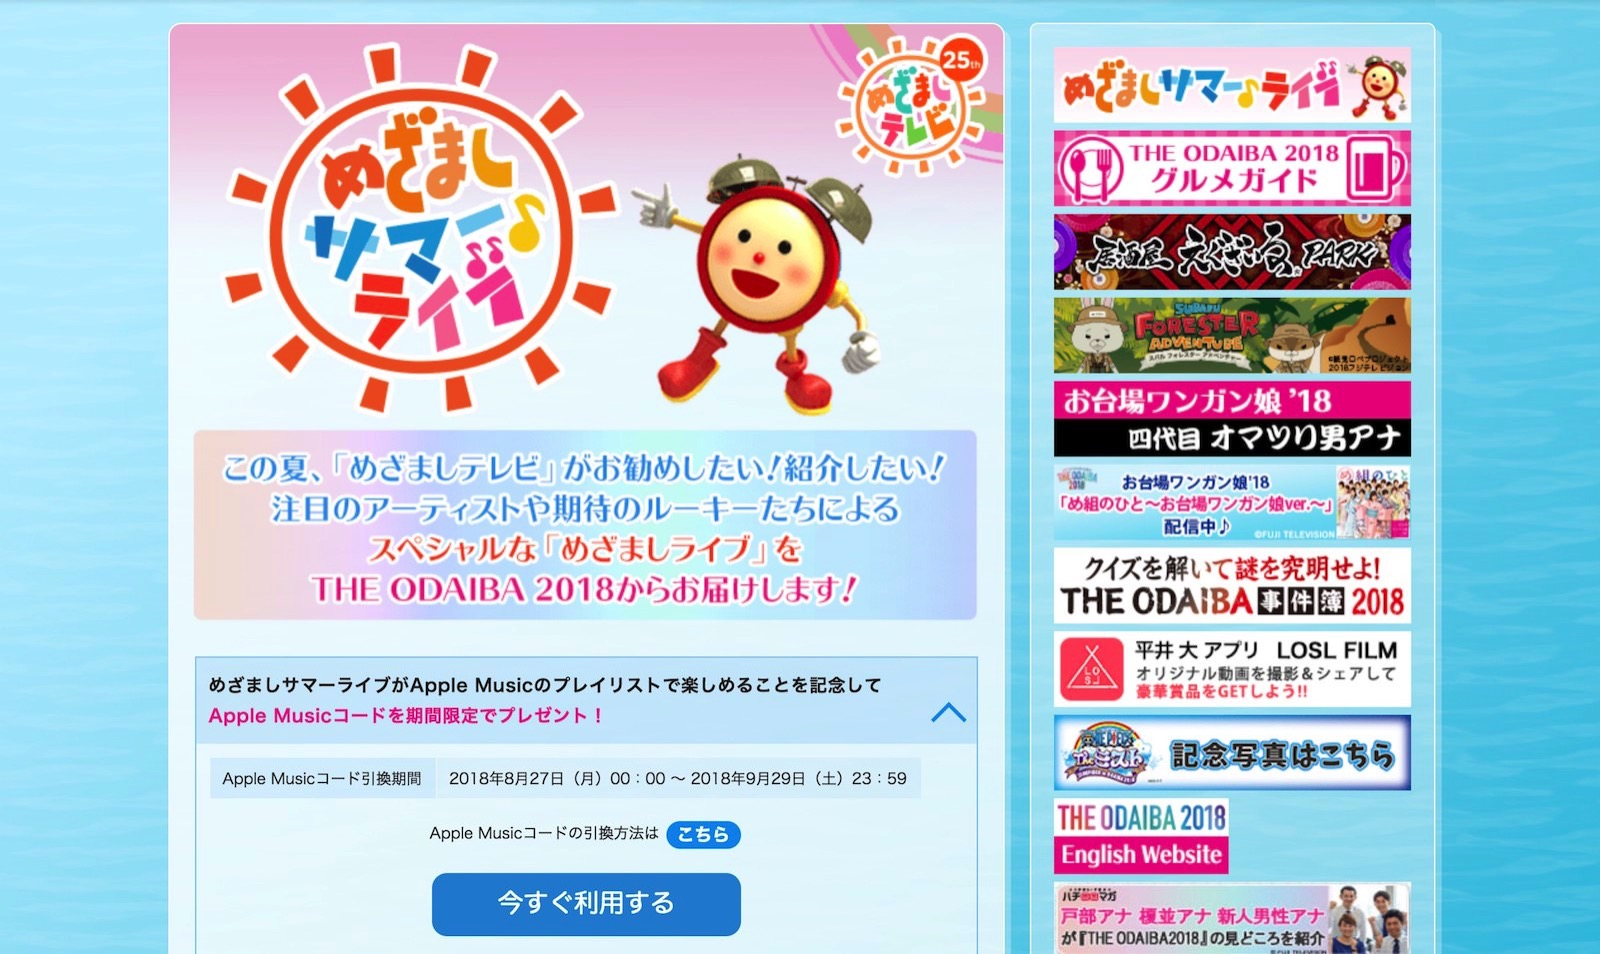 The Odaiba Apple Music Free Campaign